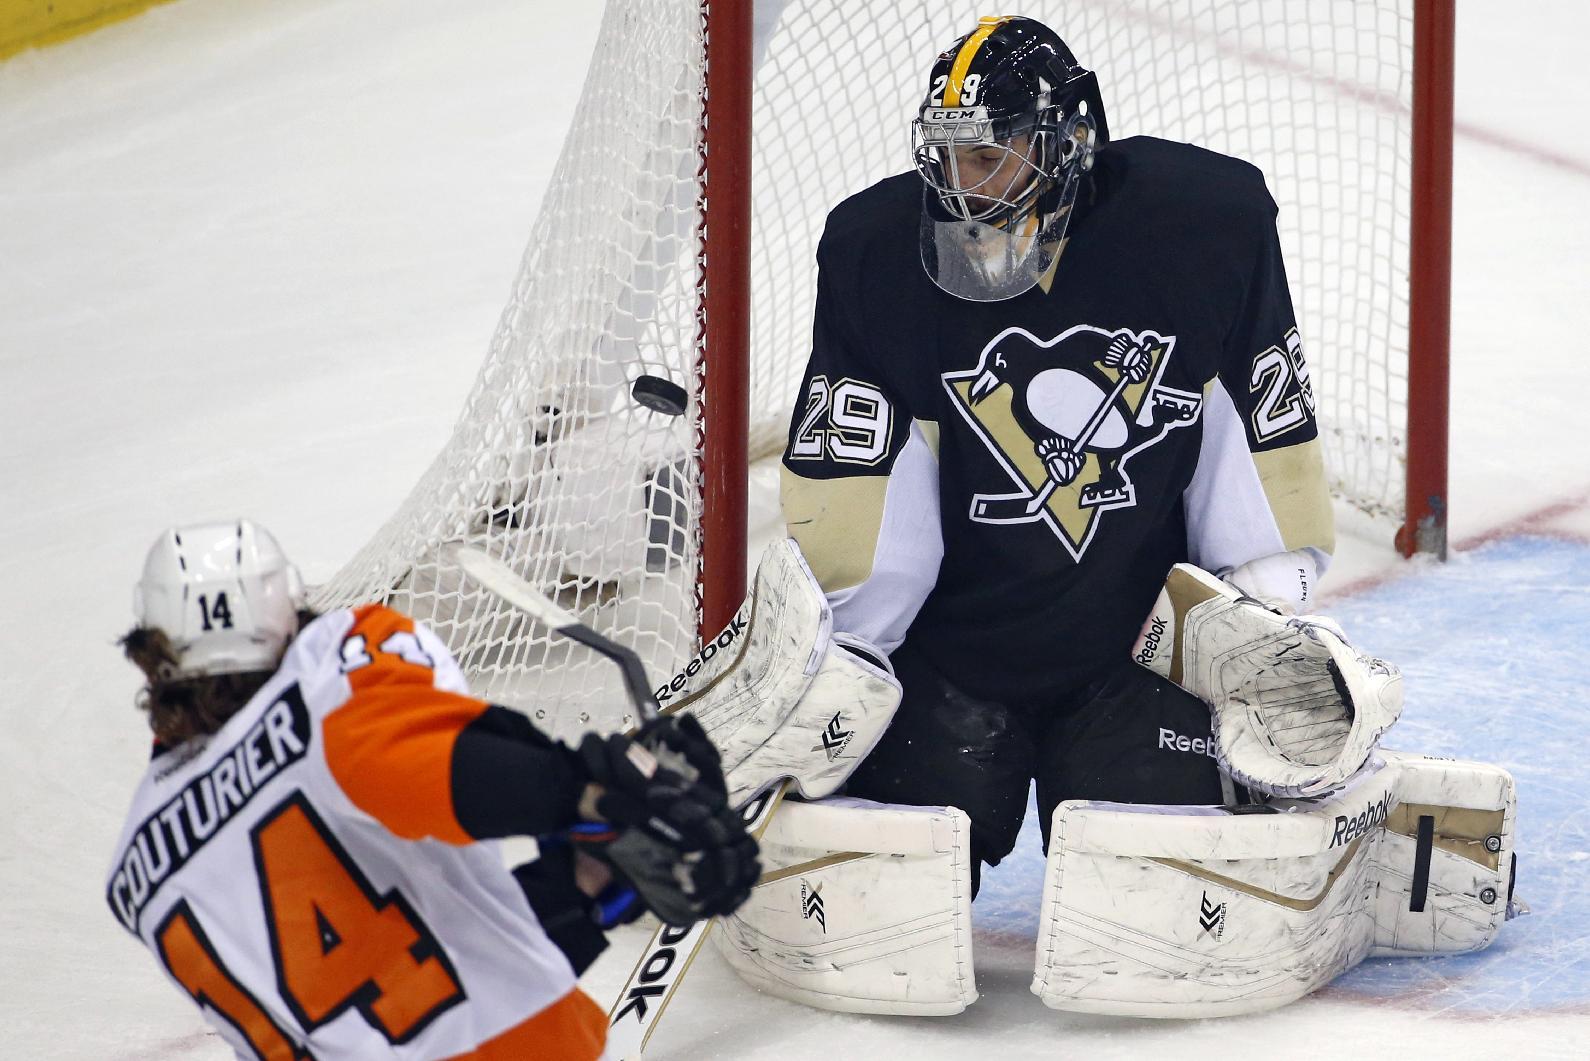 Streit's OT goal lifts Flyers over Penguins 4-3